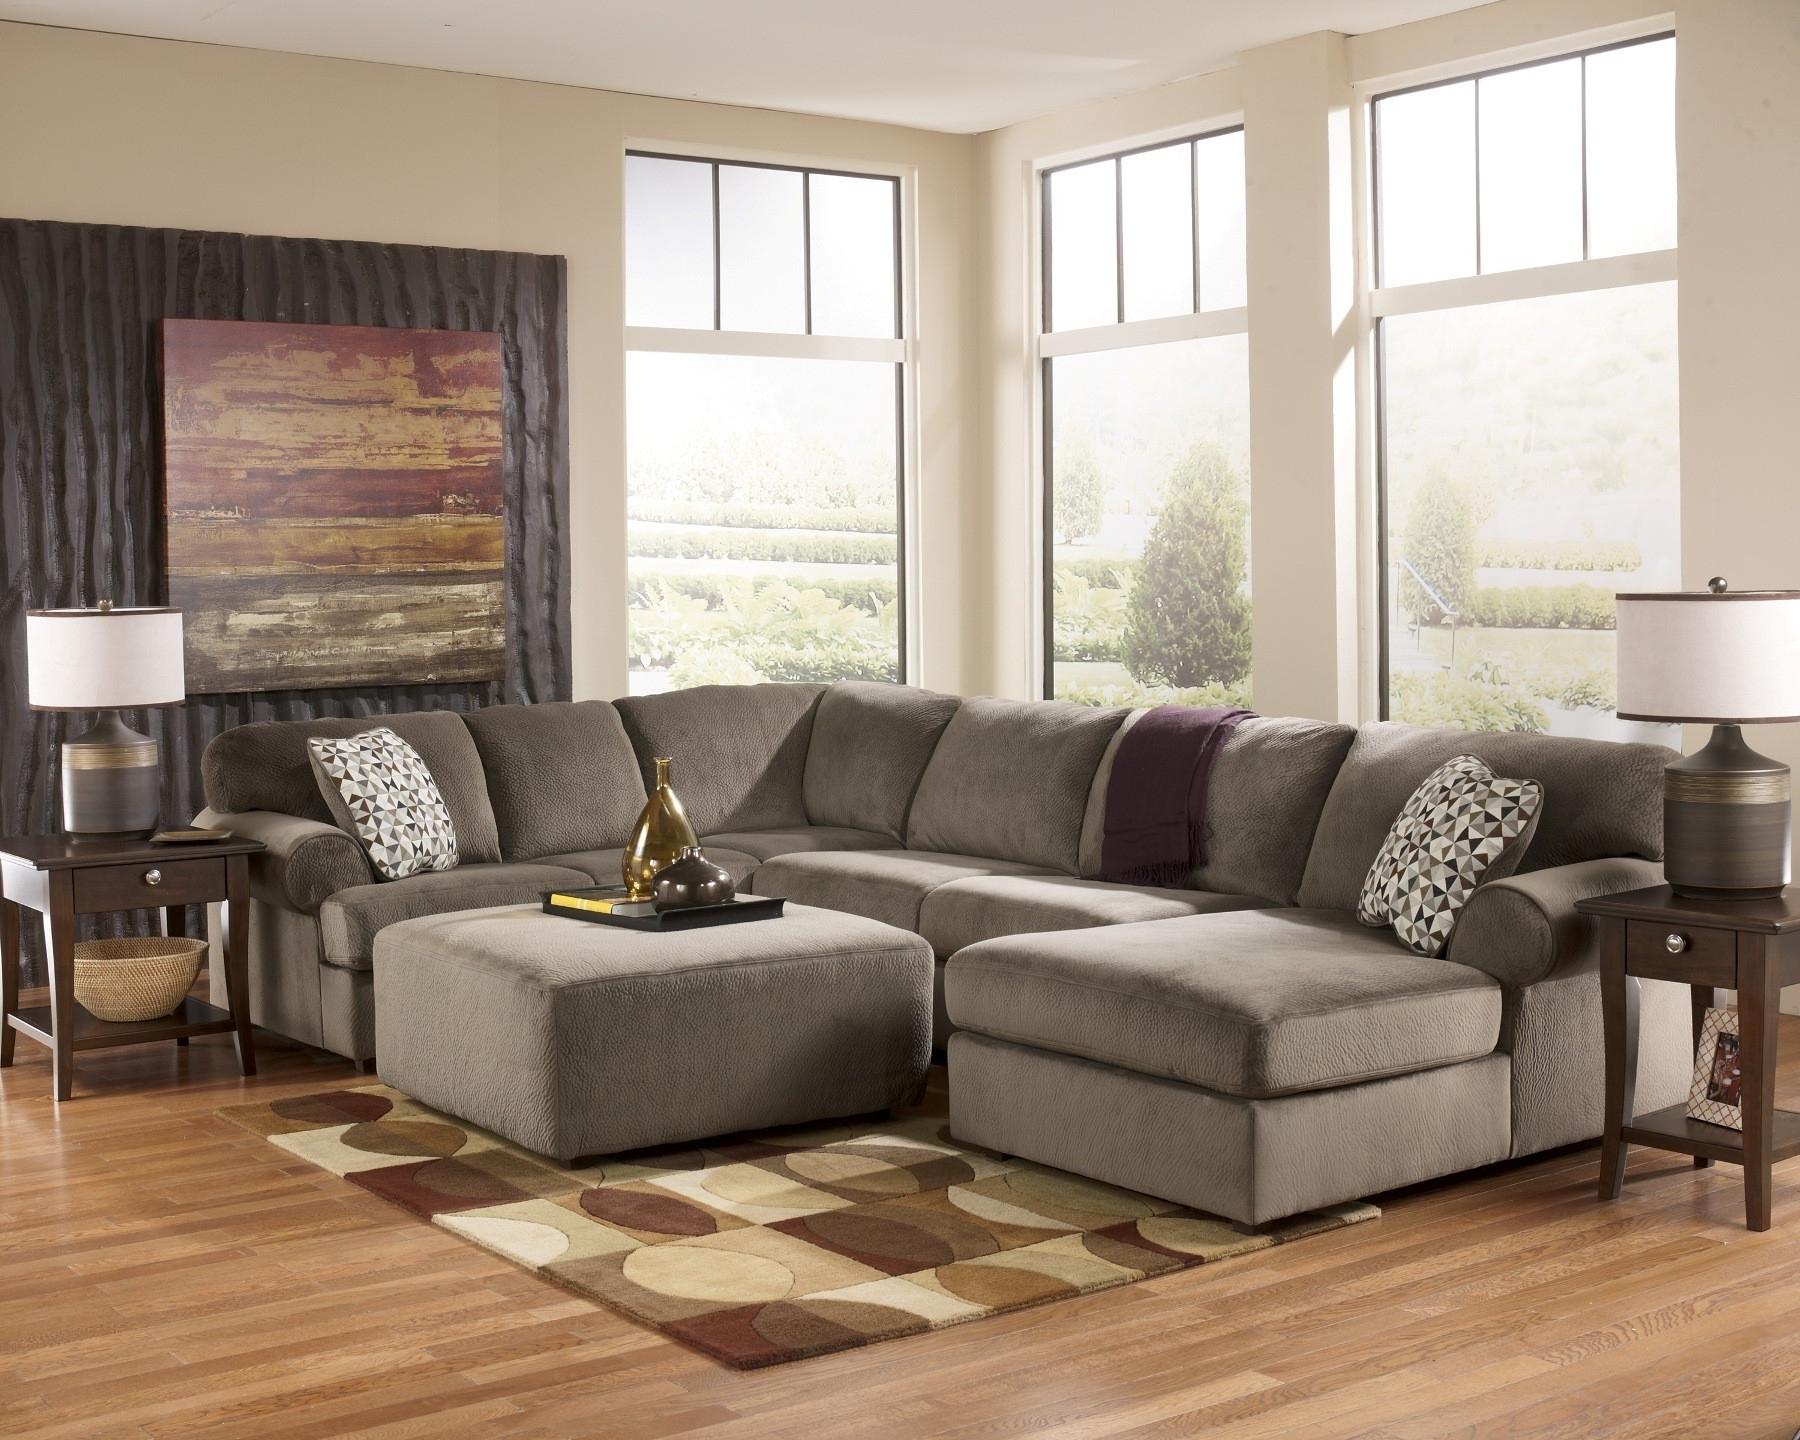 El Paso Tx Sectional Sofas Regarding Current Asc Furniture – El Paso, Tx (View 6 of 15)